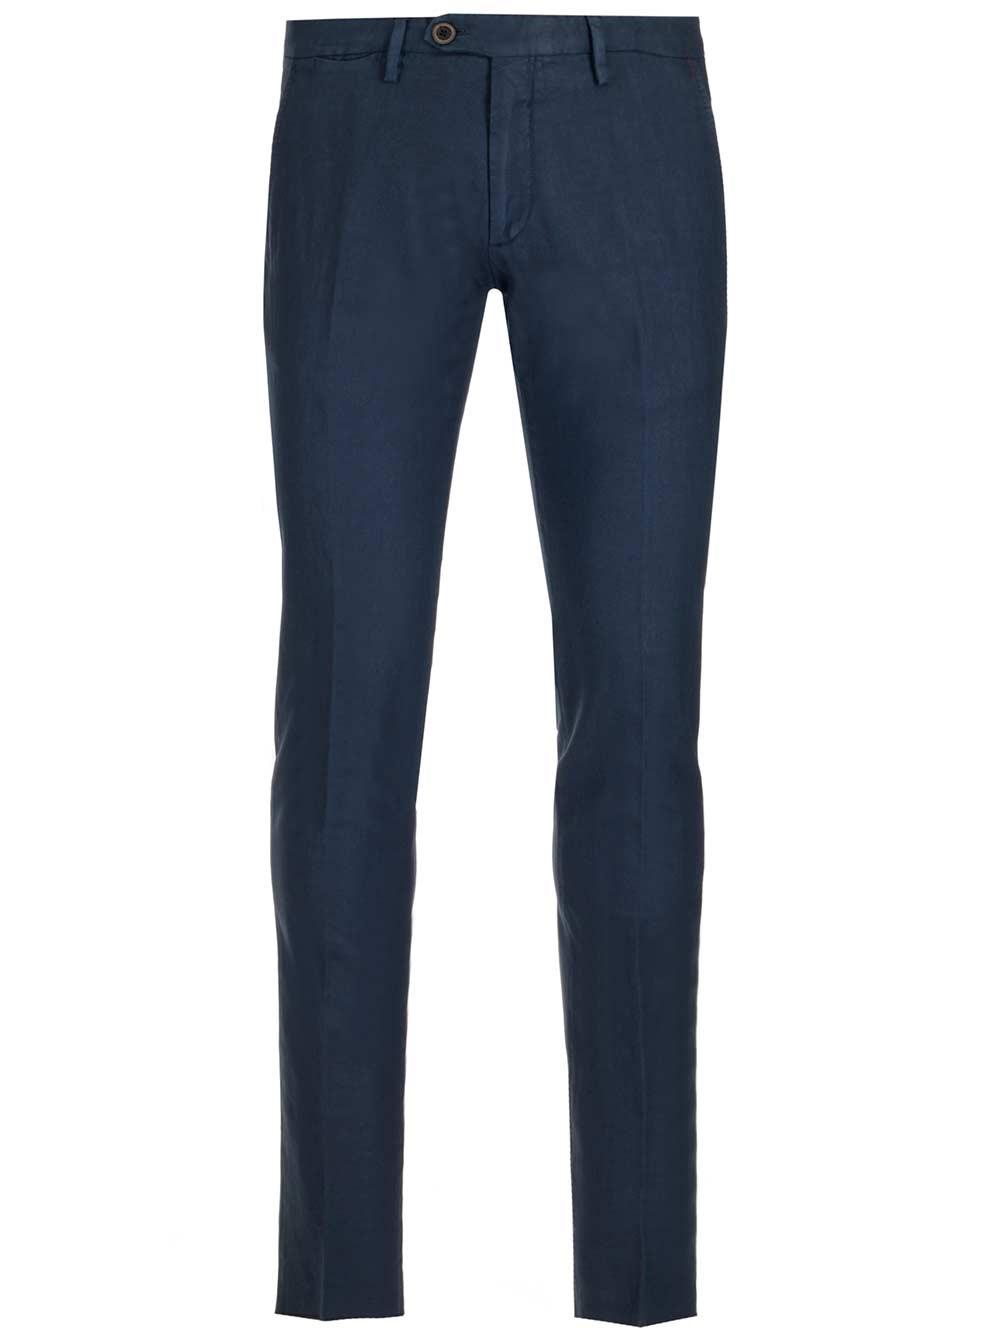 AL DUCA D'AOSTA 1902 Cotton And Linen Chino Trousers